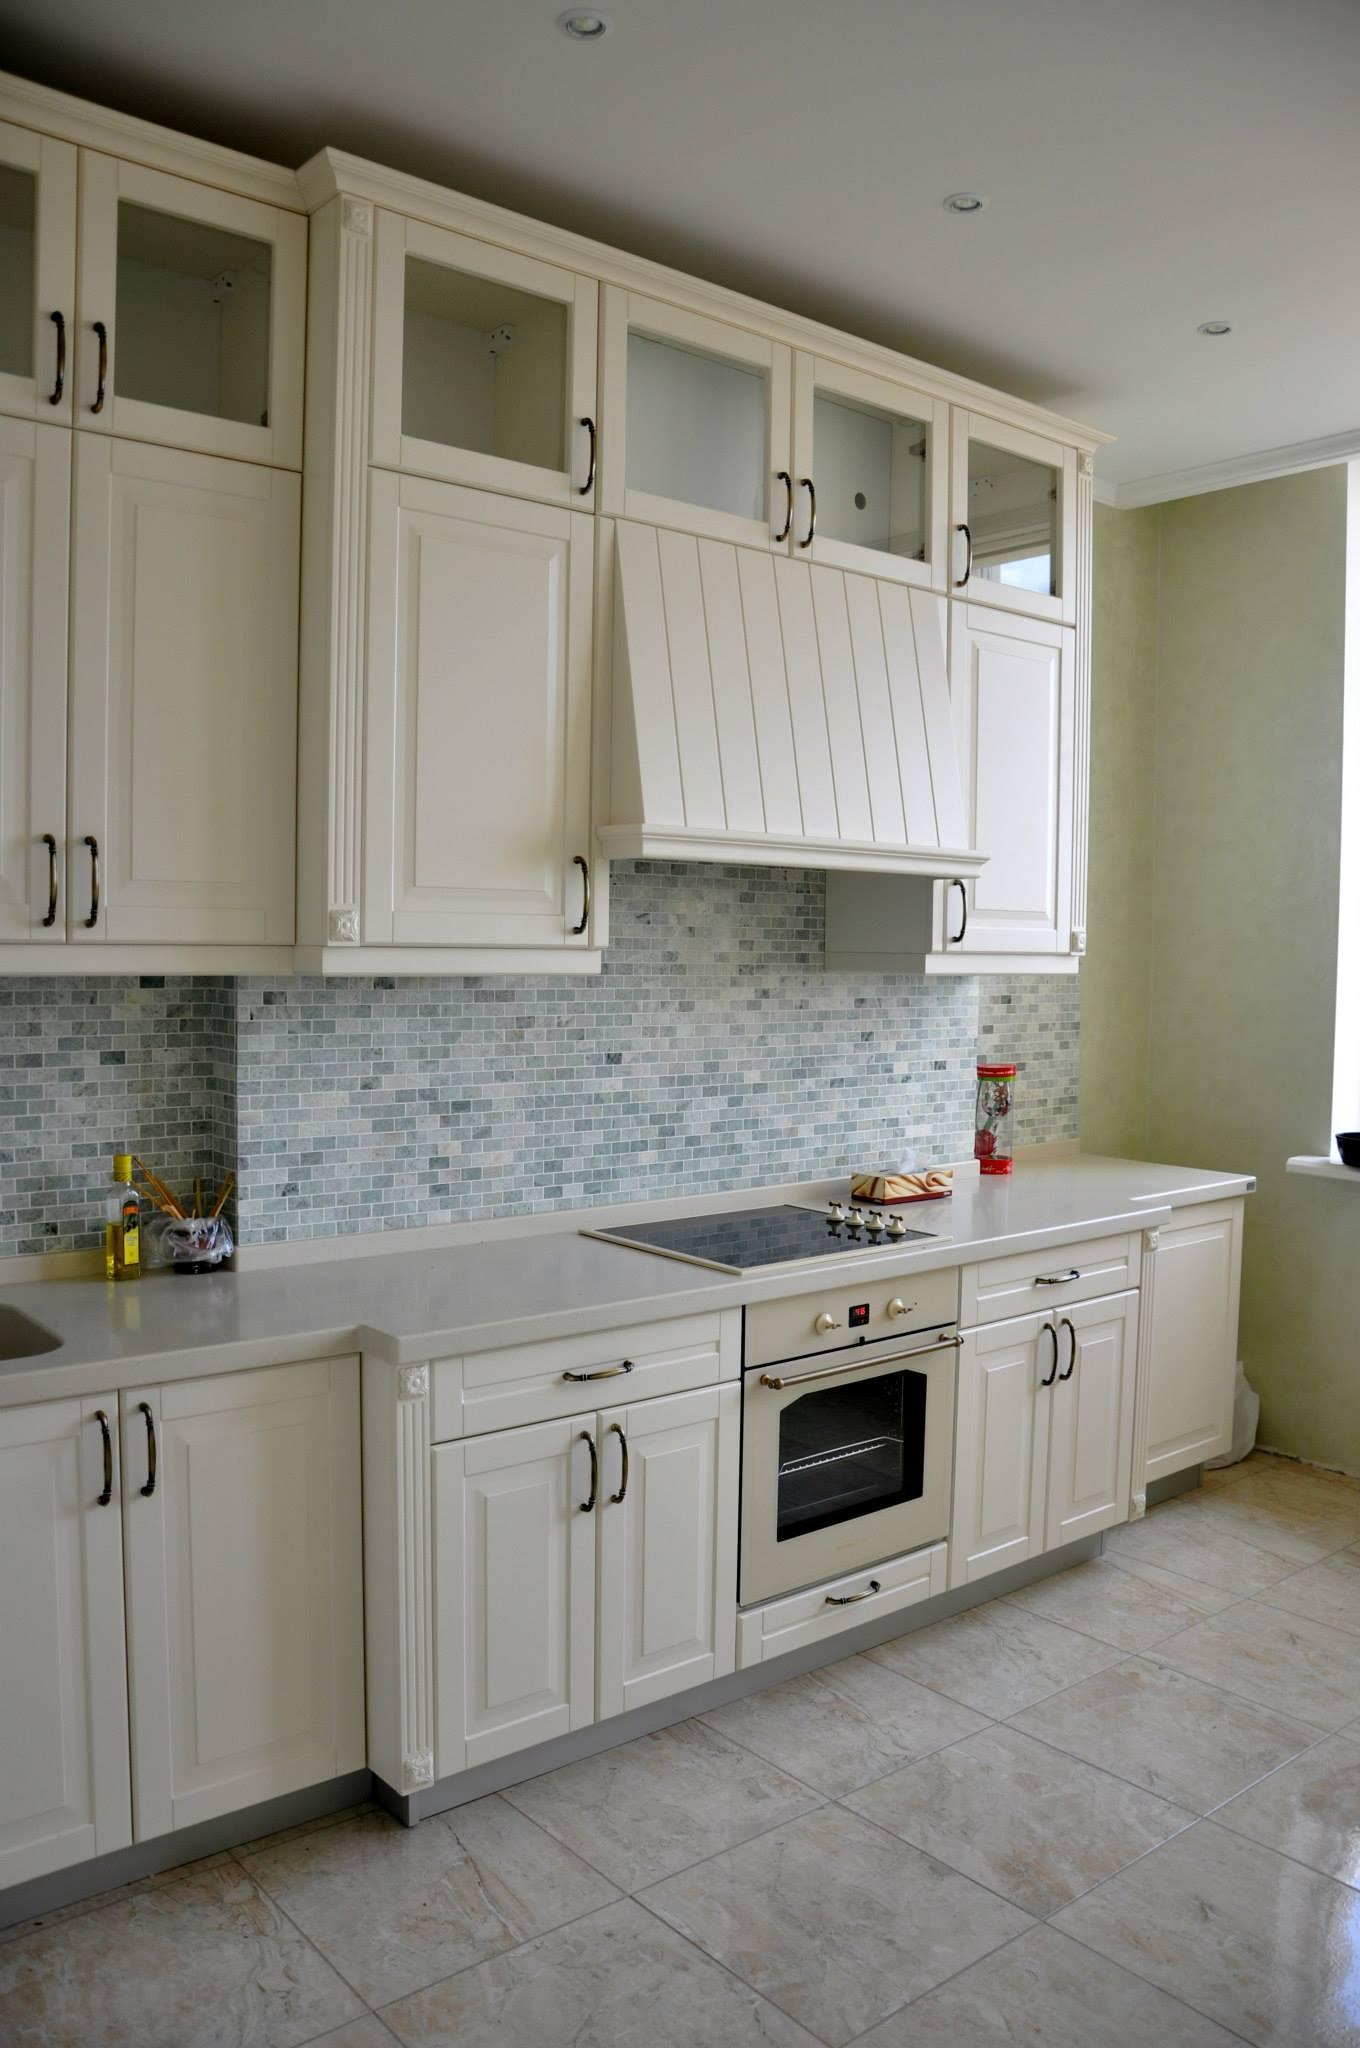 Фартук под мелкий кирпич в светлой кухне в стиле прованс